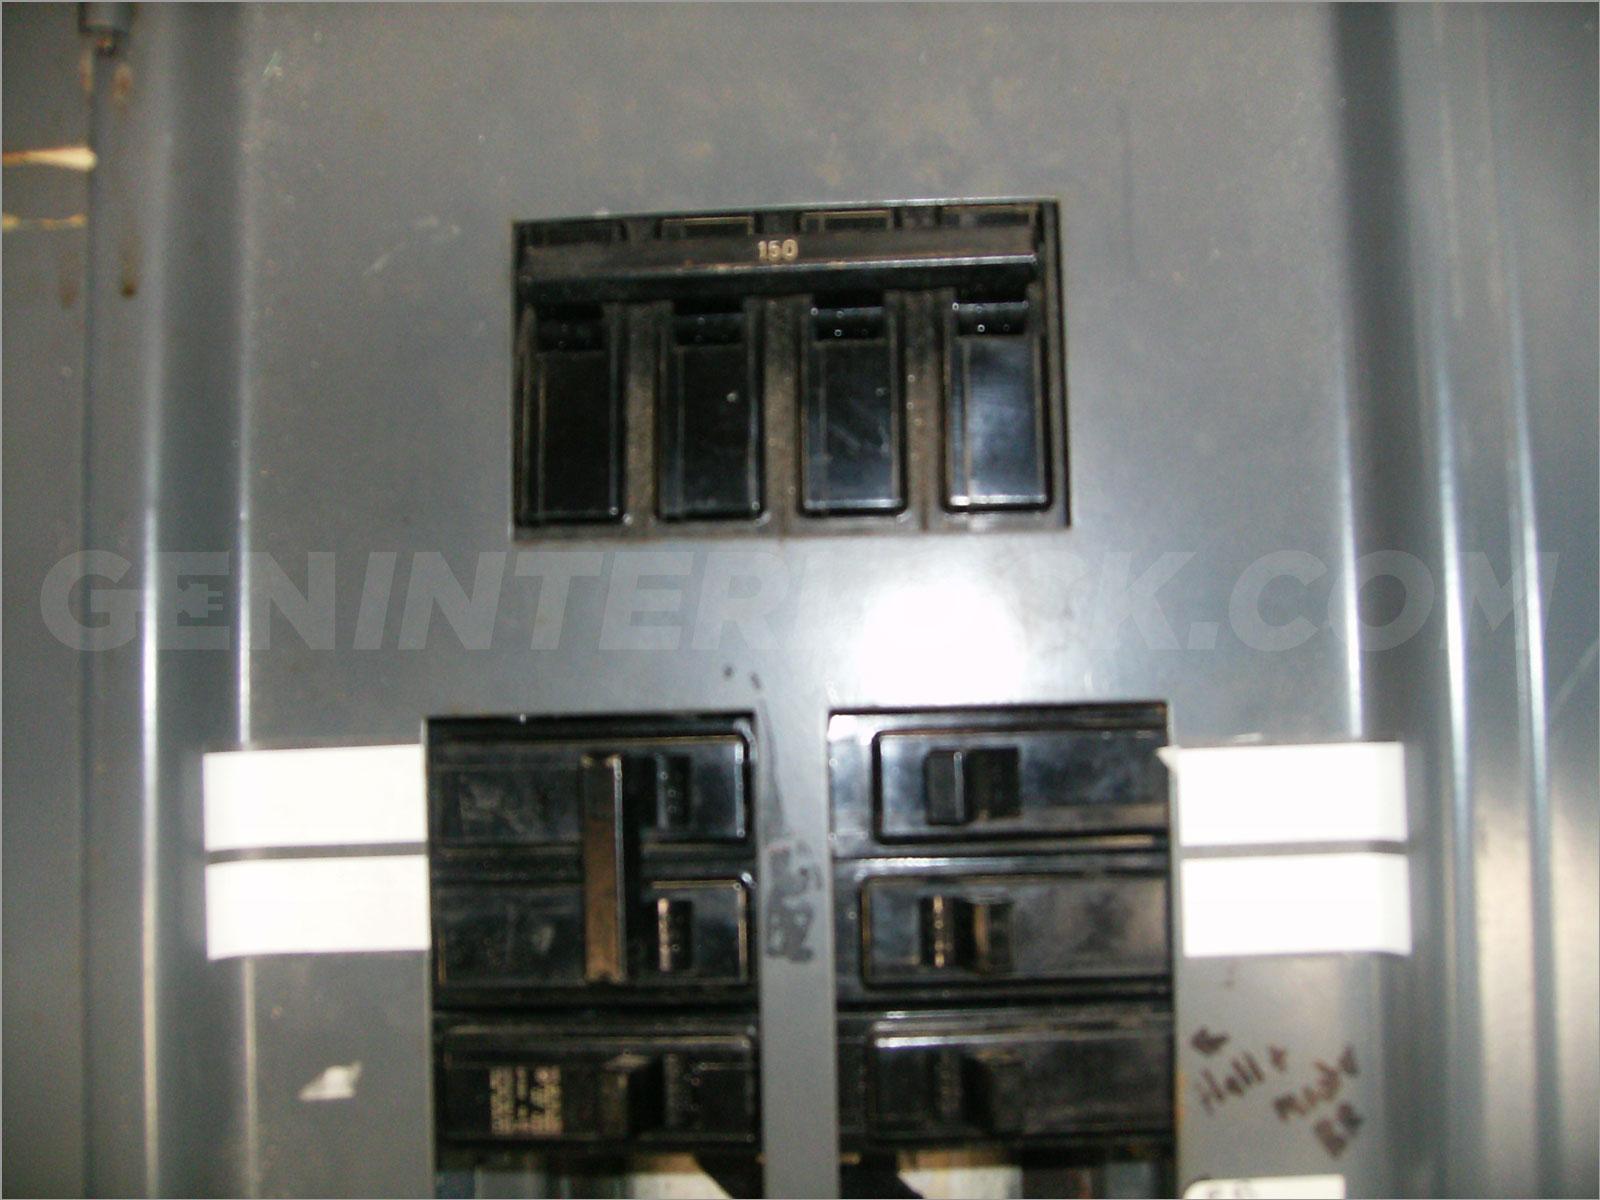 Generator interlock kit Siemens and ITE 150 and 200 Amp Panels